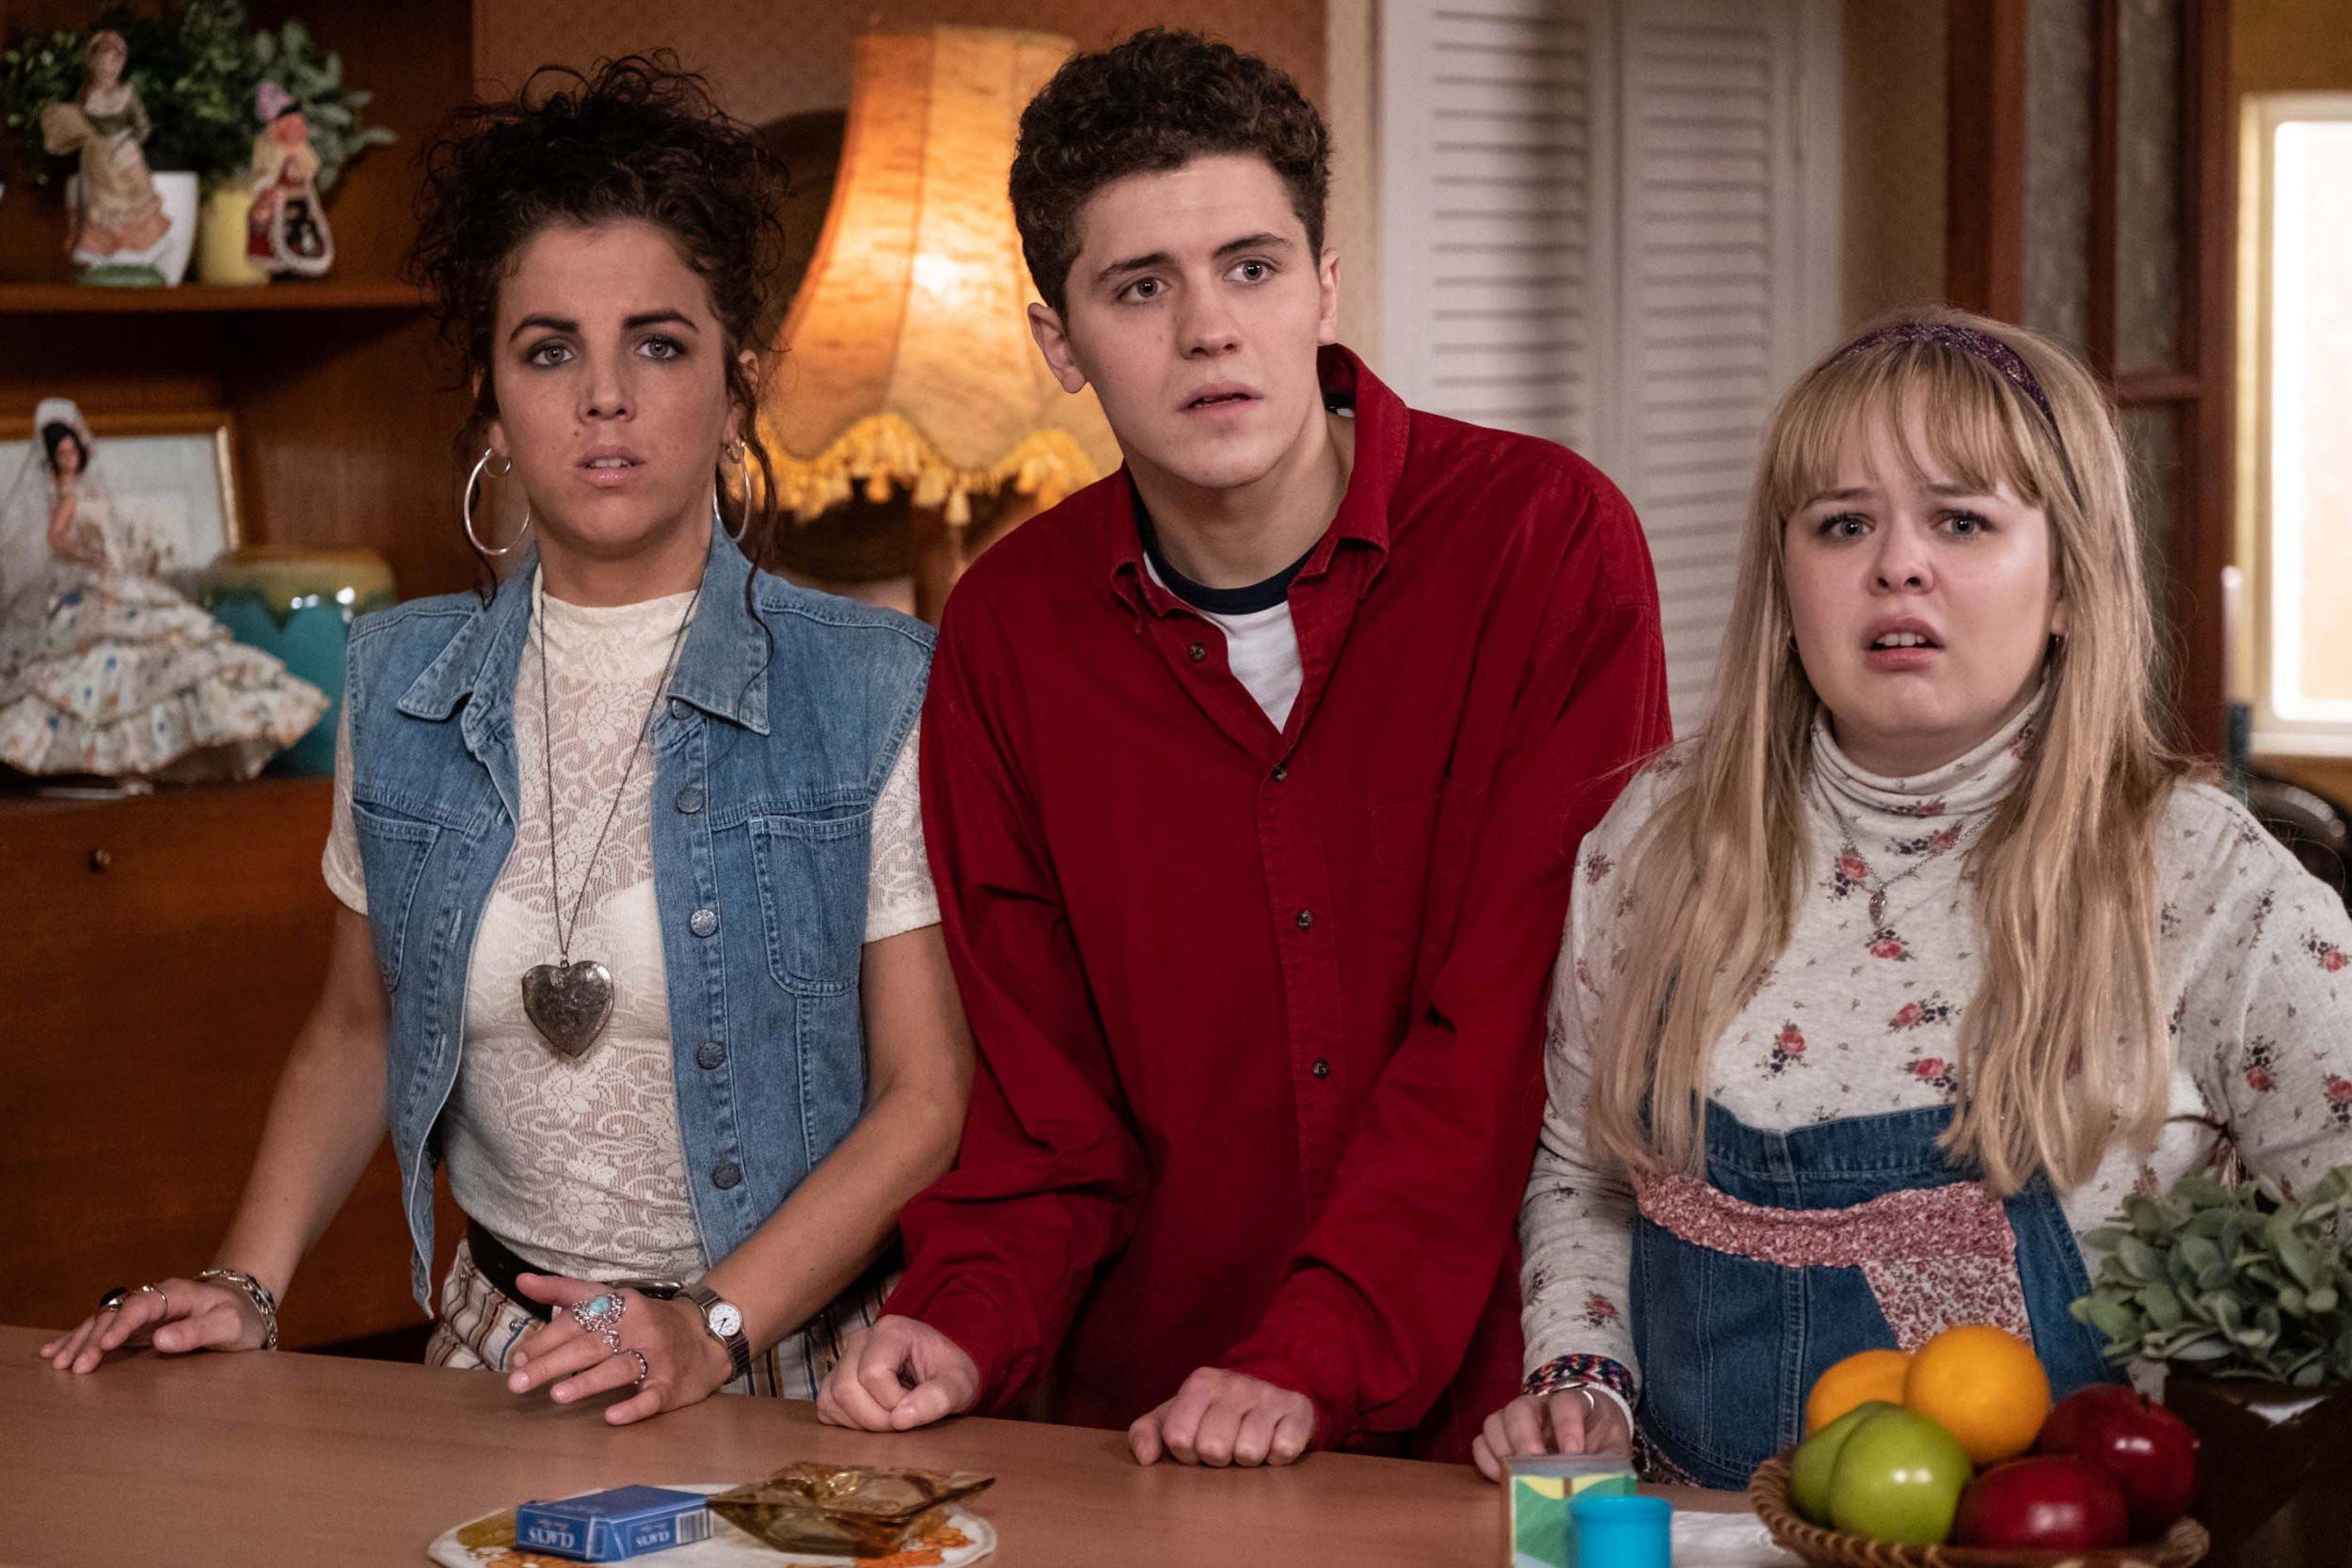 Derry Girls star Nicola Coughlan confirms season three will begin filming this year despite coronavirus delays